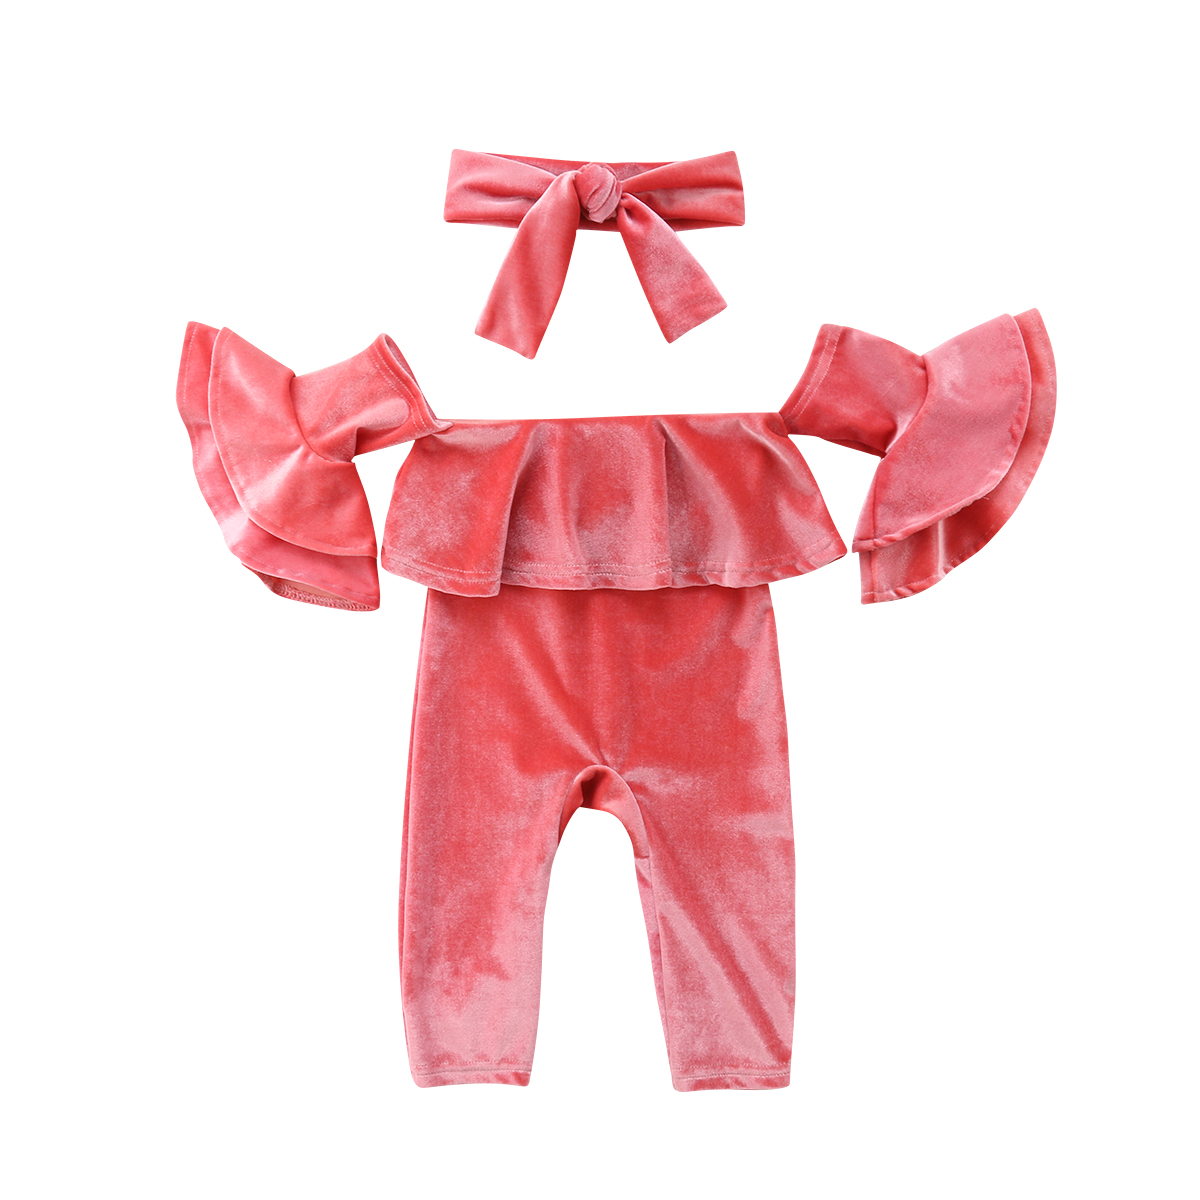 Toodler Newborn Kids Baby Girl Velvet Ruffle Romper Jumpsuit Off Shoulder Cute Casual Headband Outfits Clothes Set Girl 0-5T